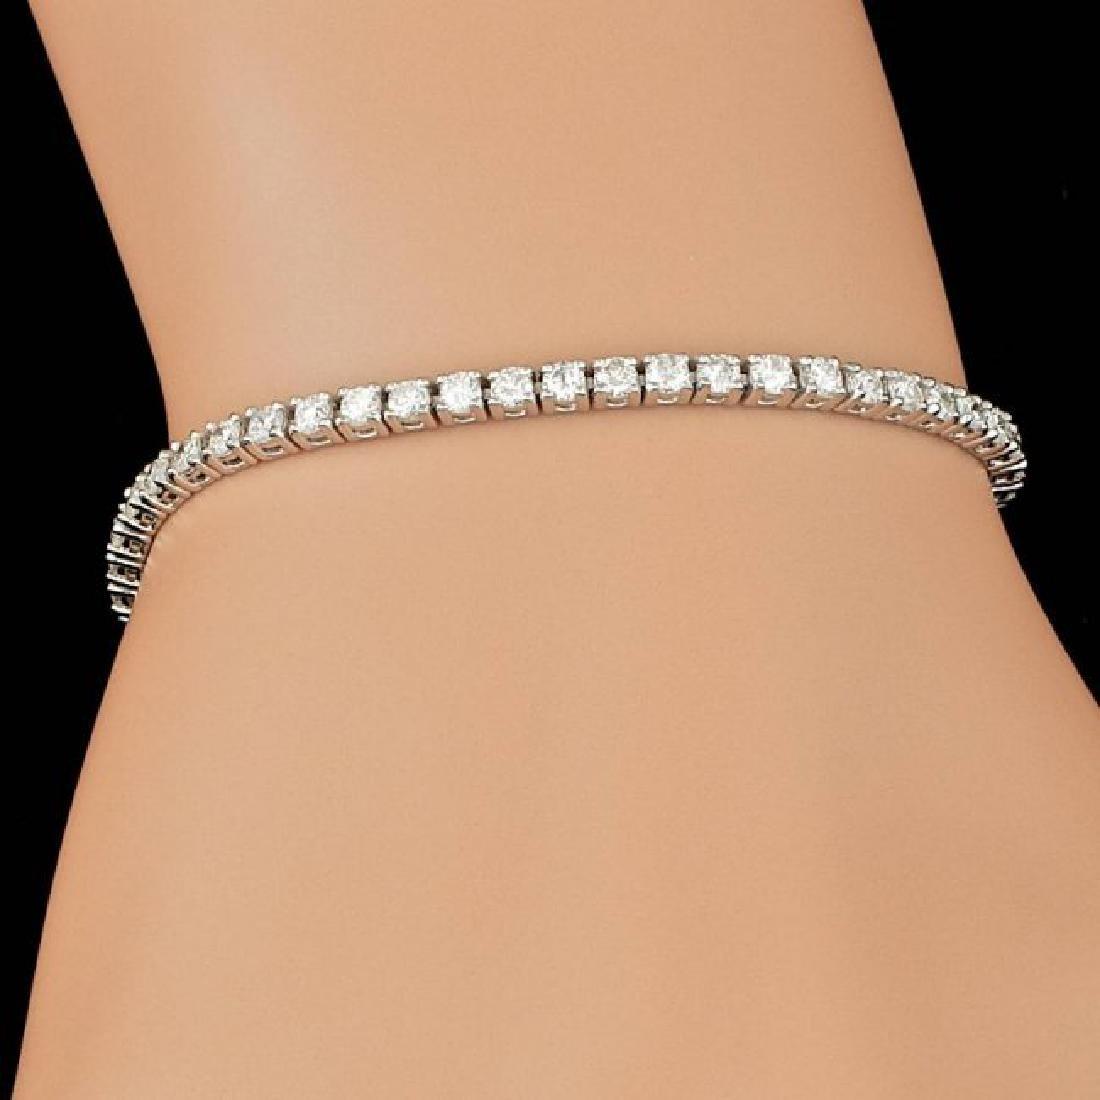 14k White Gold 3.70ct Diamond Bracelet - 4